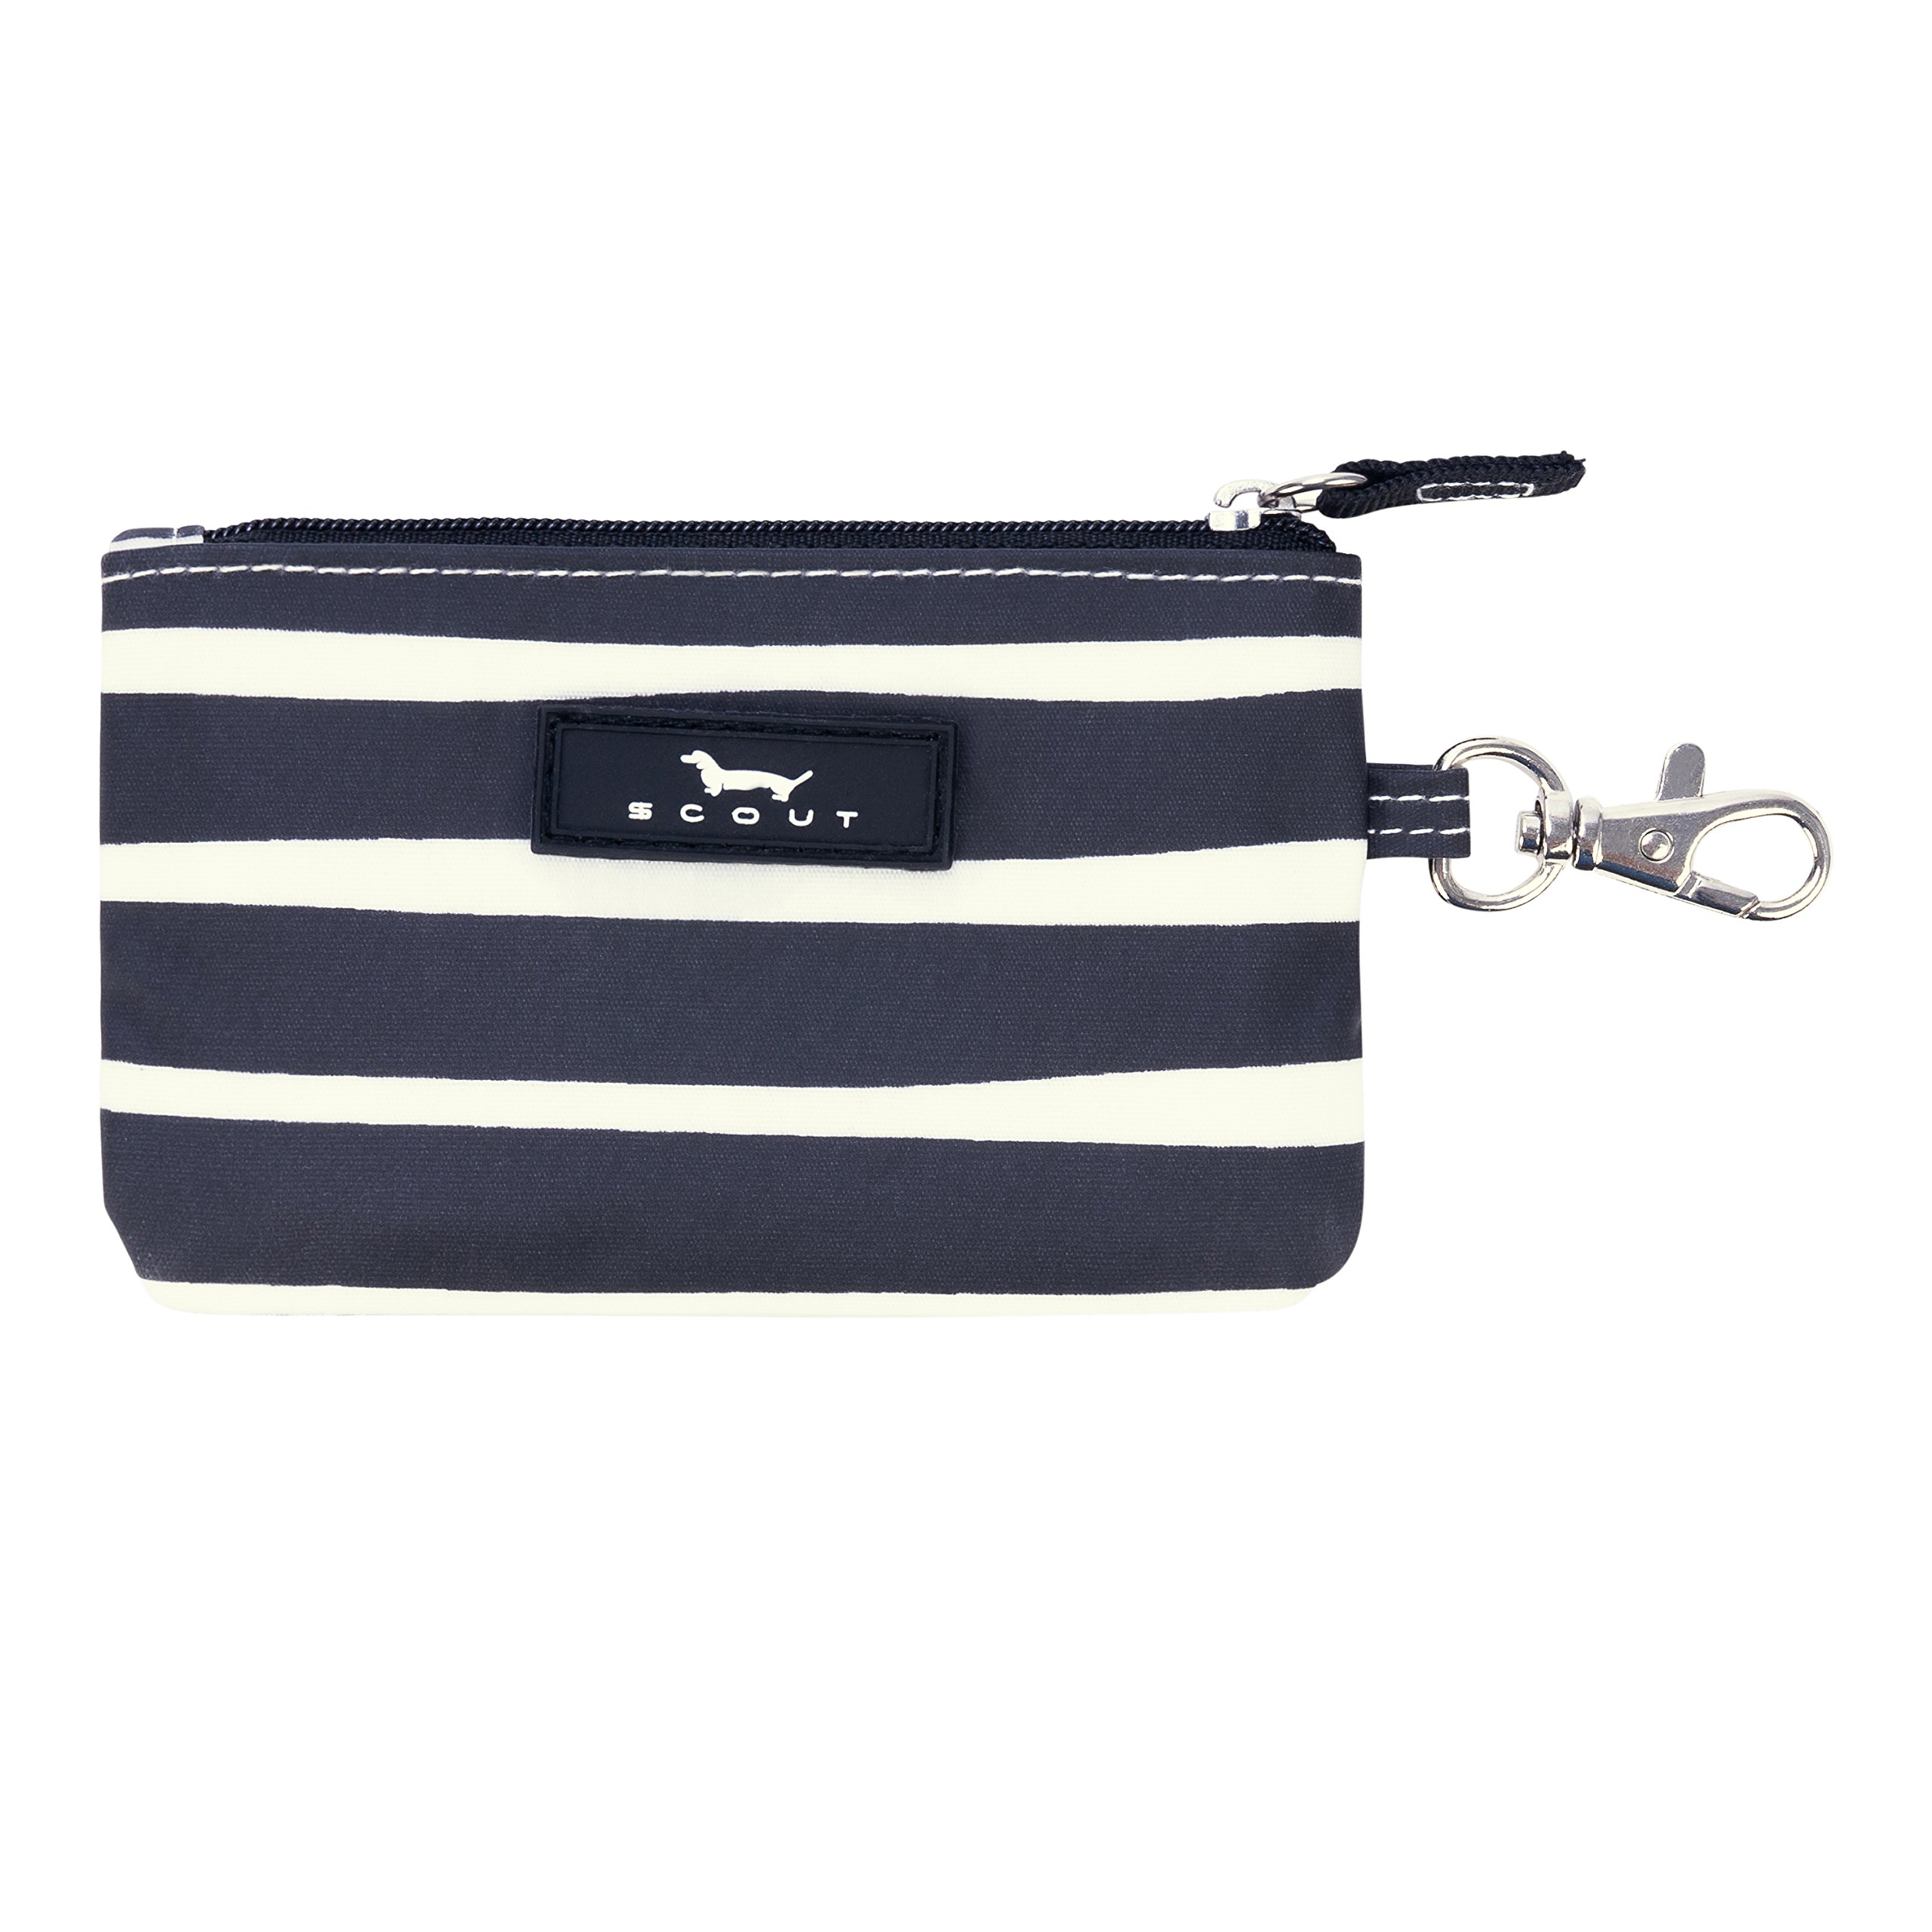 SCOUT IDKase Card Holder or Wallet, ID Holder Window, Key Clasp, Water Resistant, Zips Closed, Ren Noir